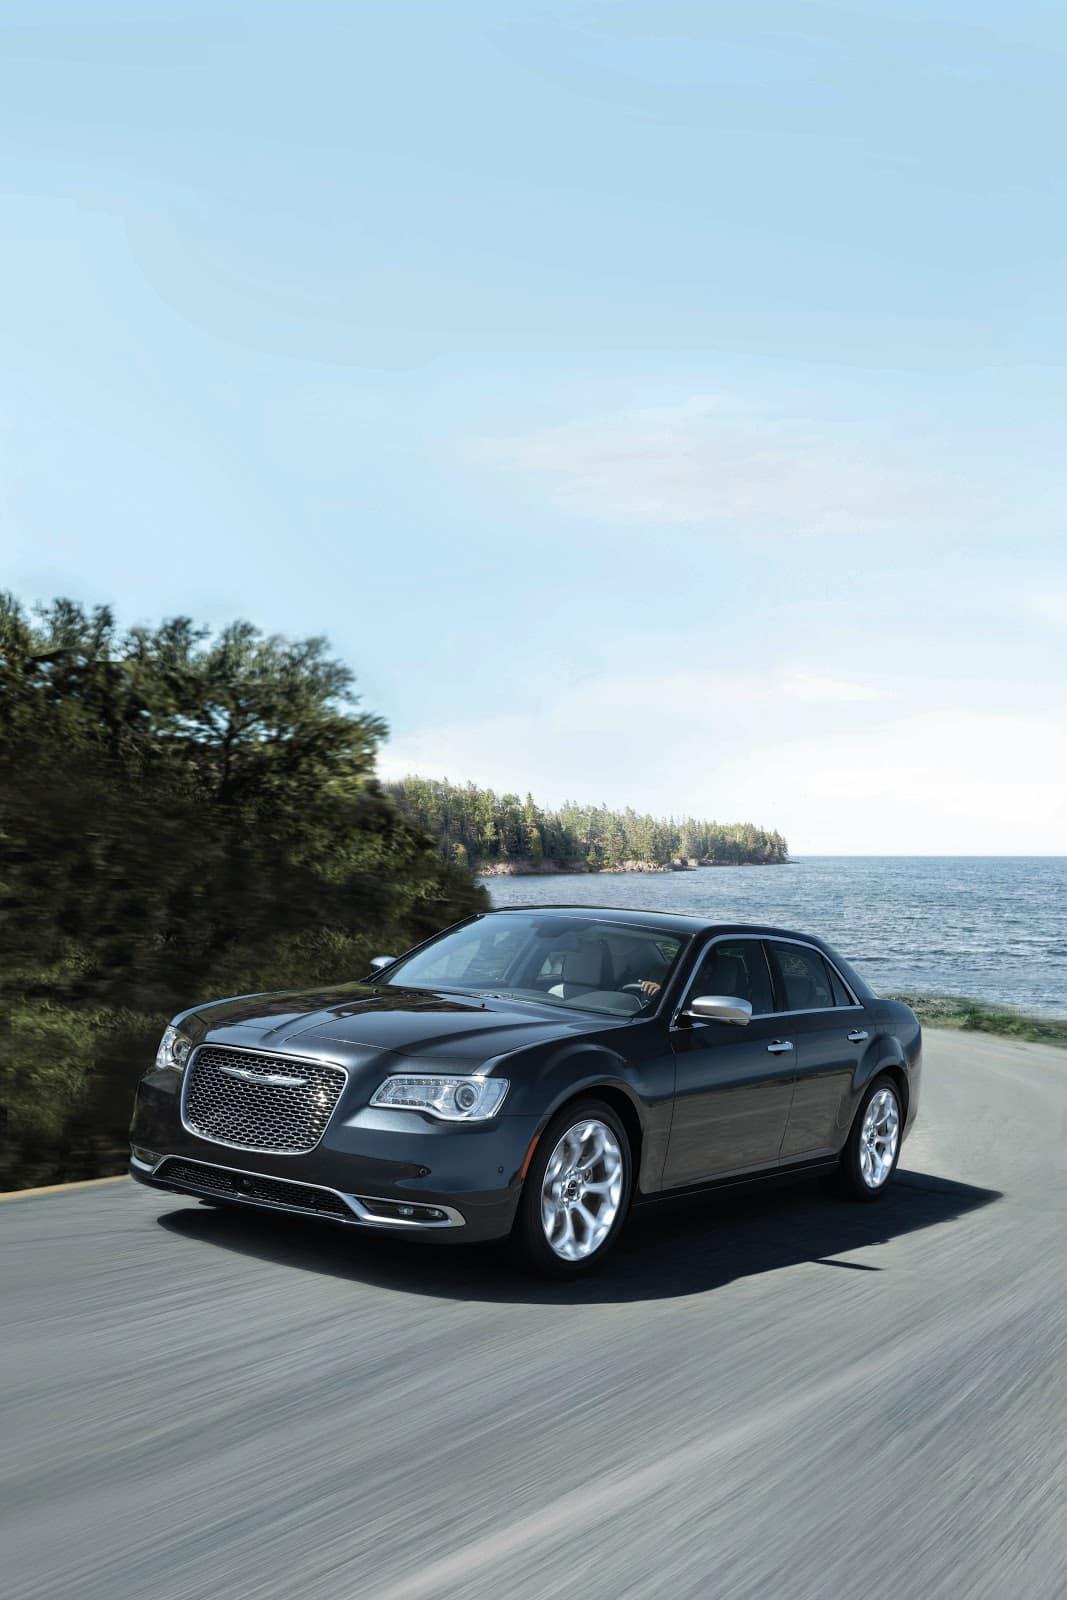 Black Chrysler 300 Driving Down Coastal Highway